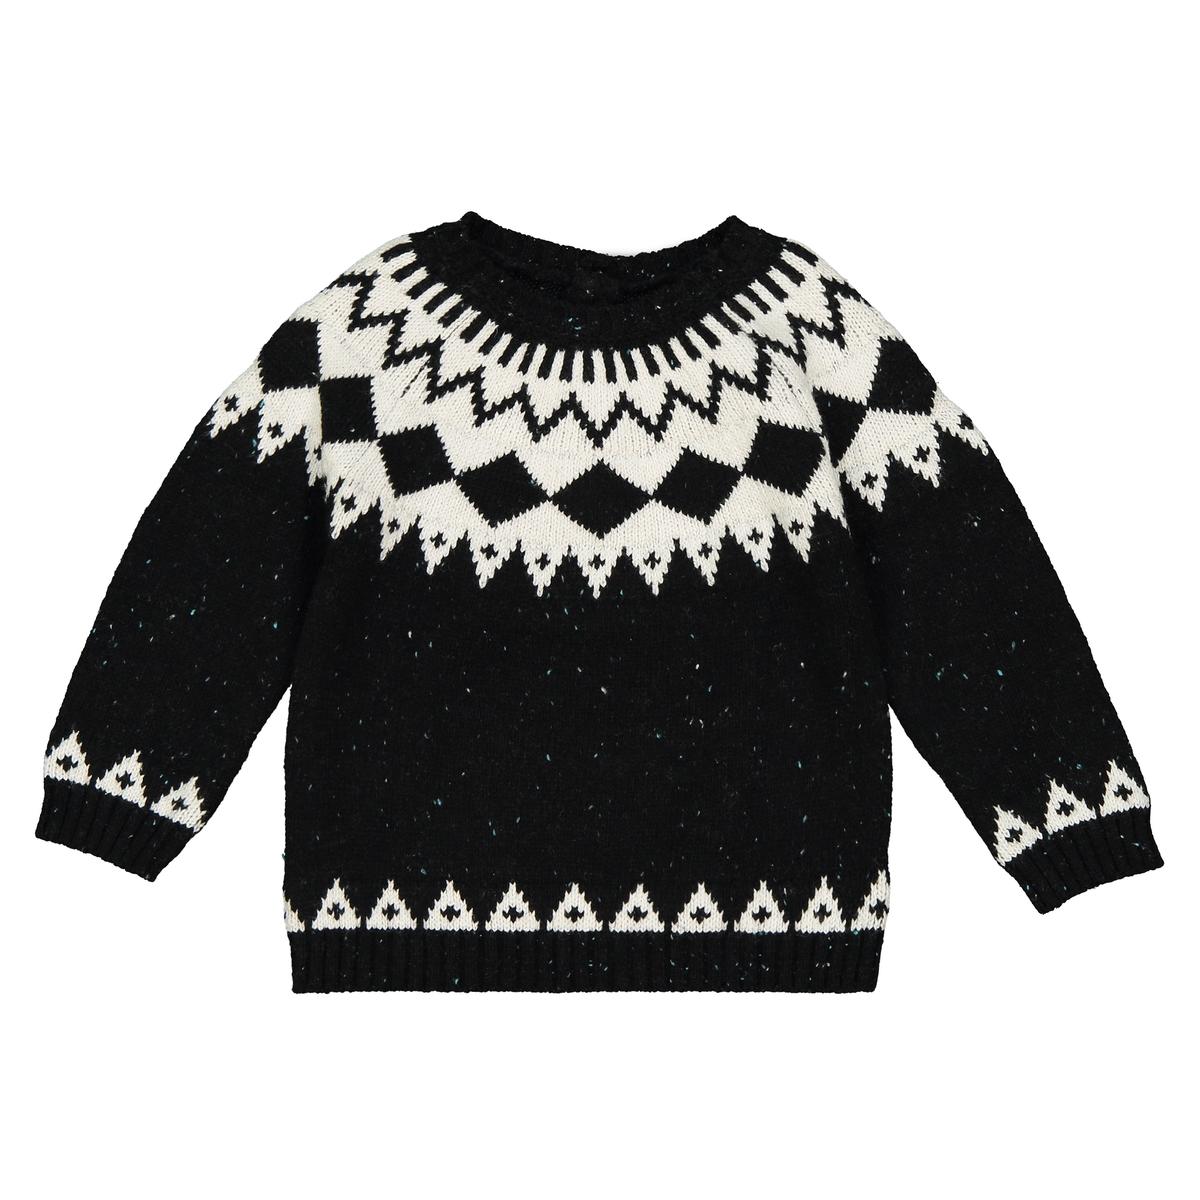 Пуловер с жаккардовым рисунком из плотного трикотажа, 1 мес. - 3 года